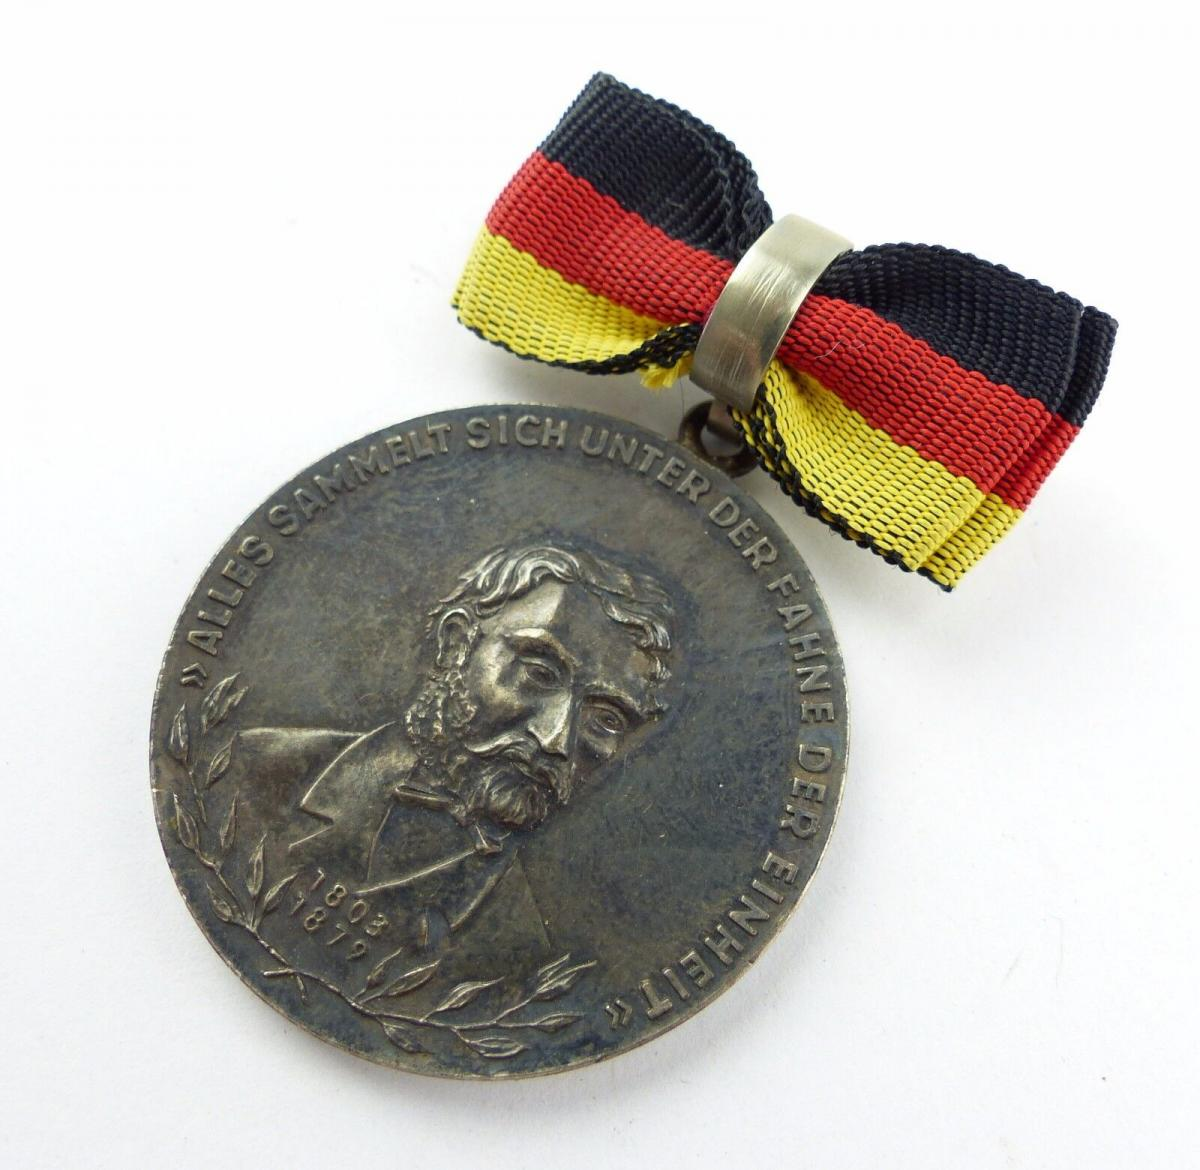 #e7761 Carl-Friedrich-Wilhelm-Wander-Medaille Silber 900 vgl. Nr. 130 (1954-55) 0